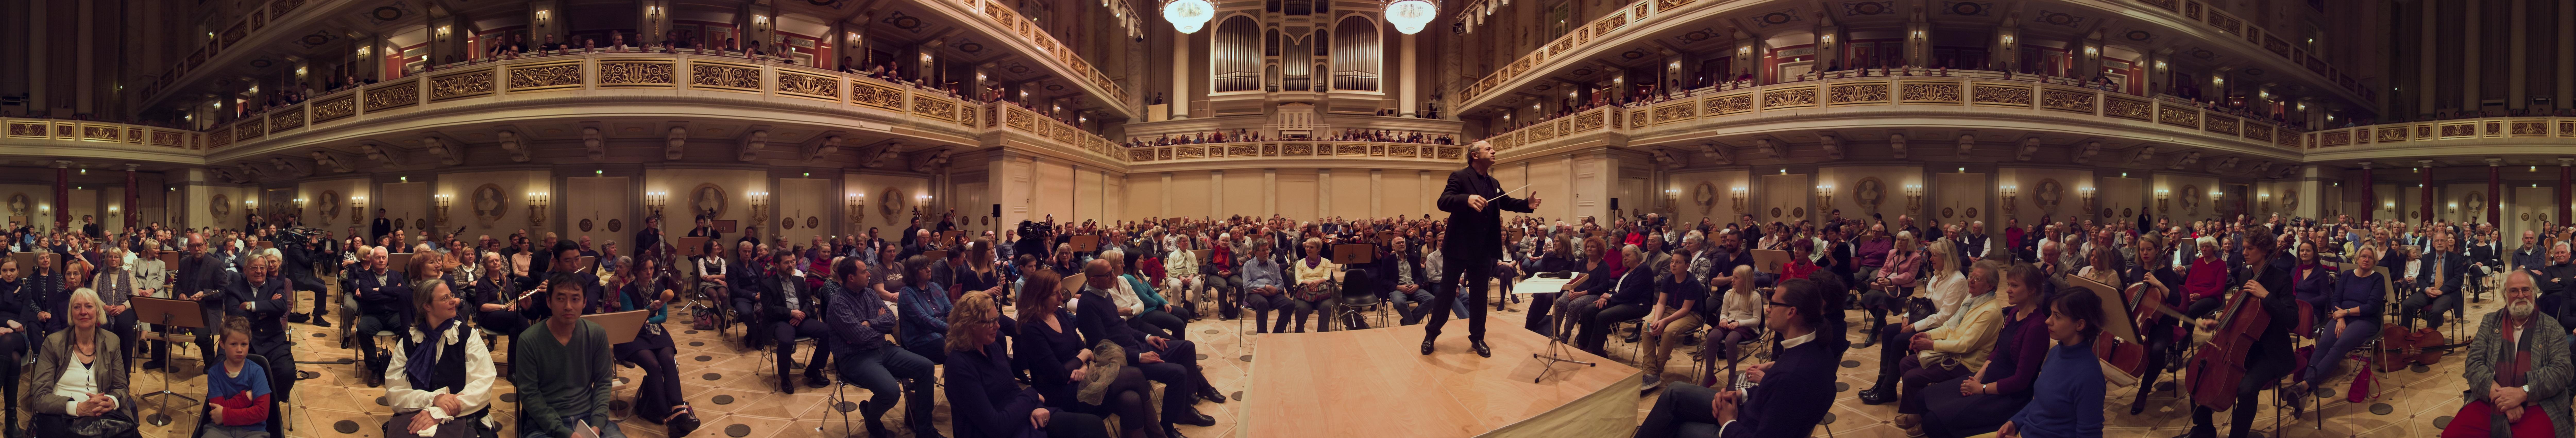 OMNICAM360_Konzerthaus_360°.jpg SES frauenhofer